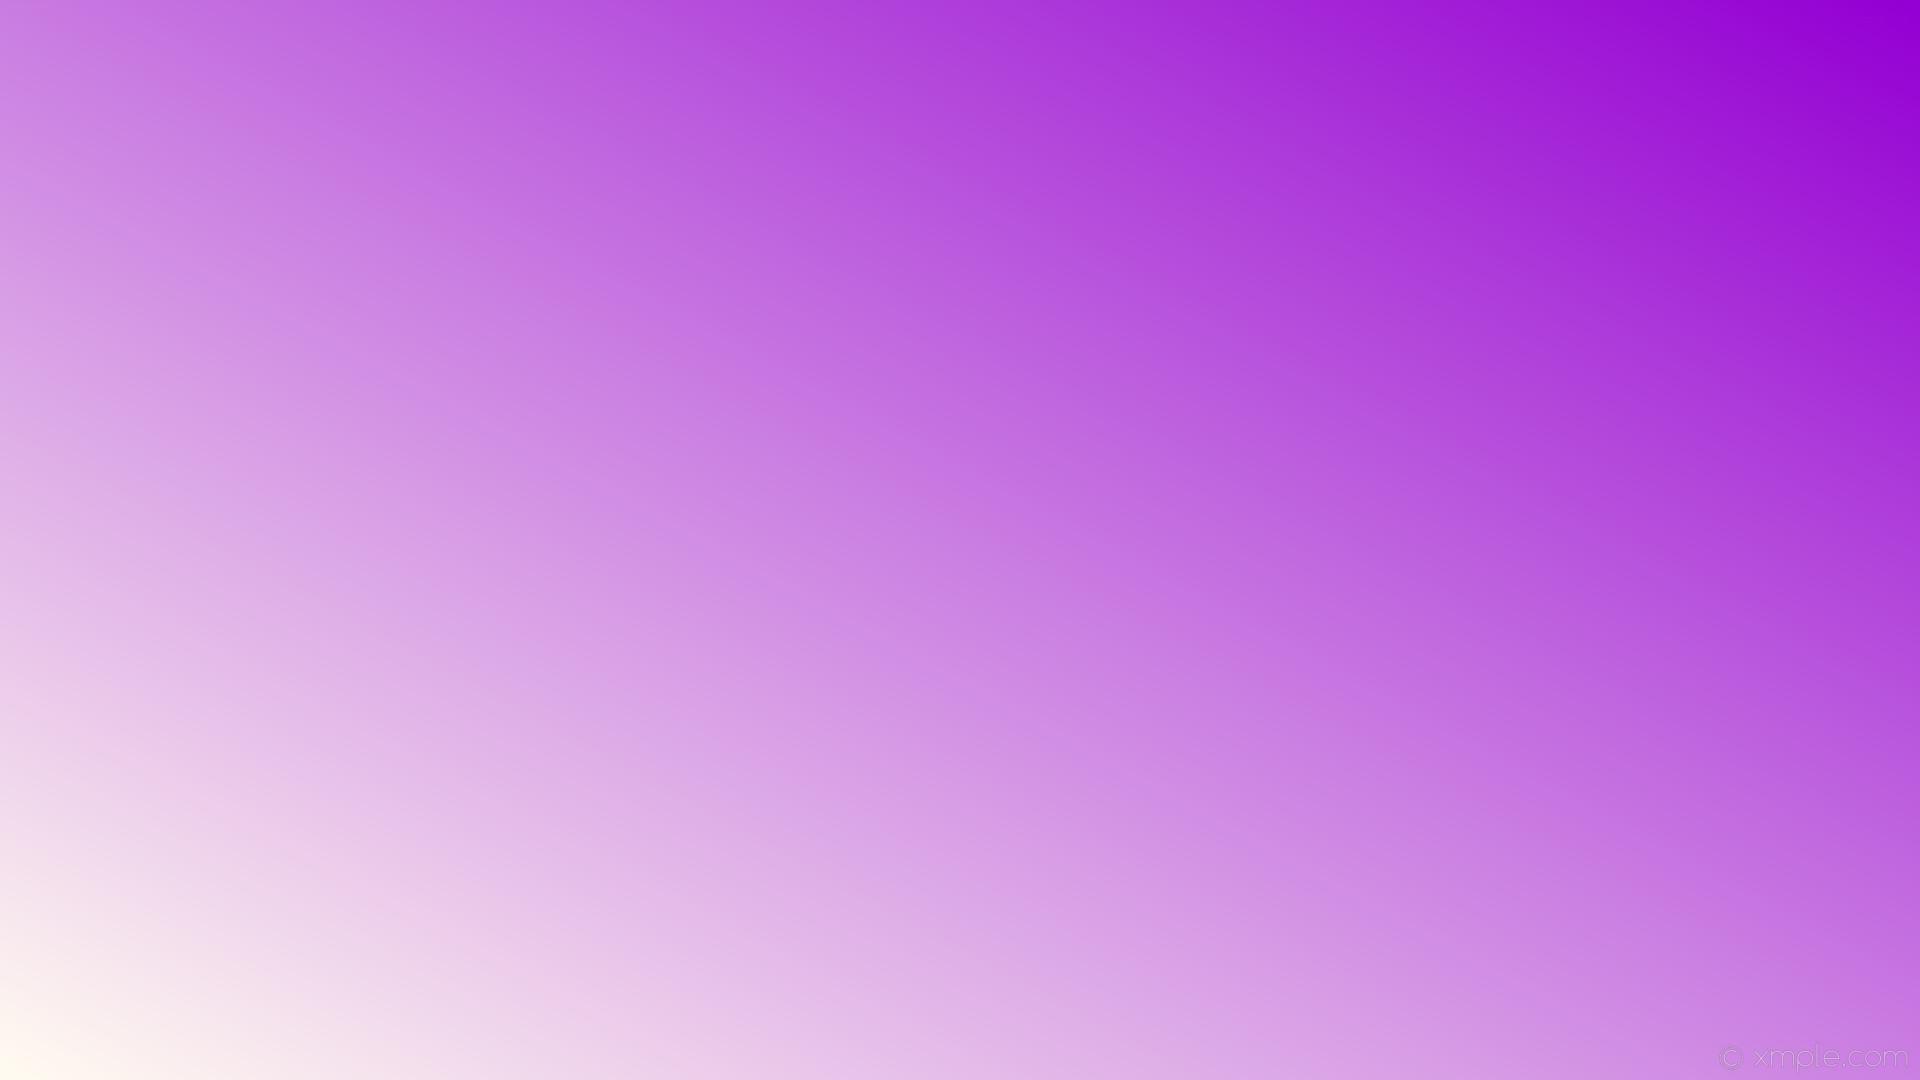 wallpaper gradient purple white linear dark violet floral white #9400d3  #fffaf0 30°